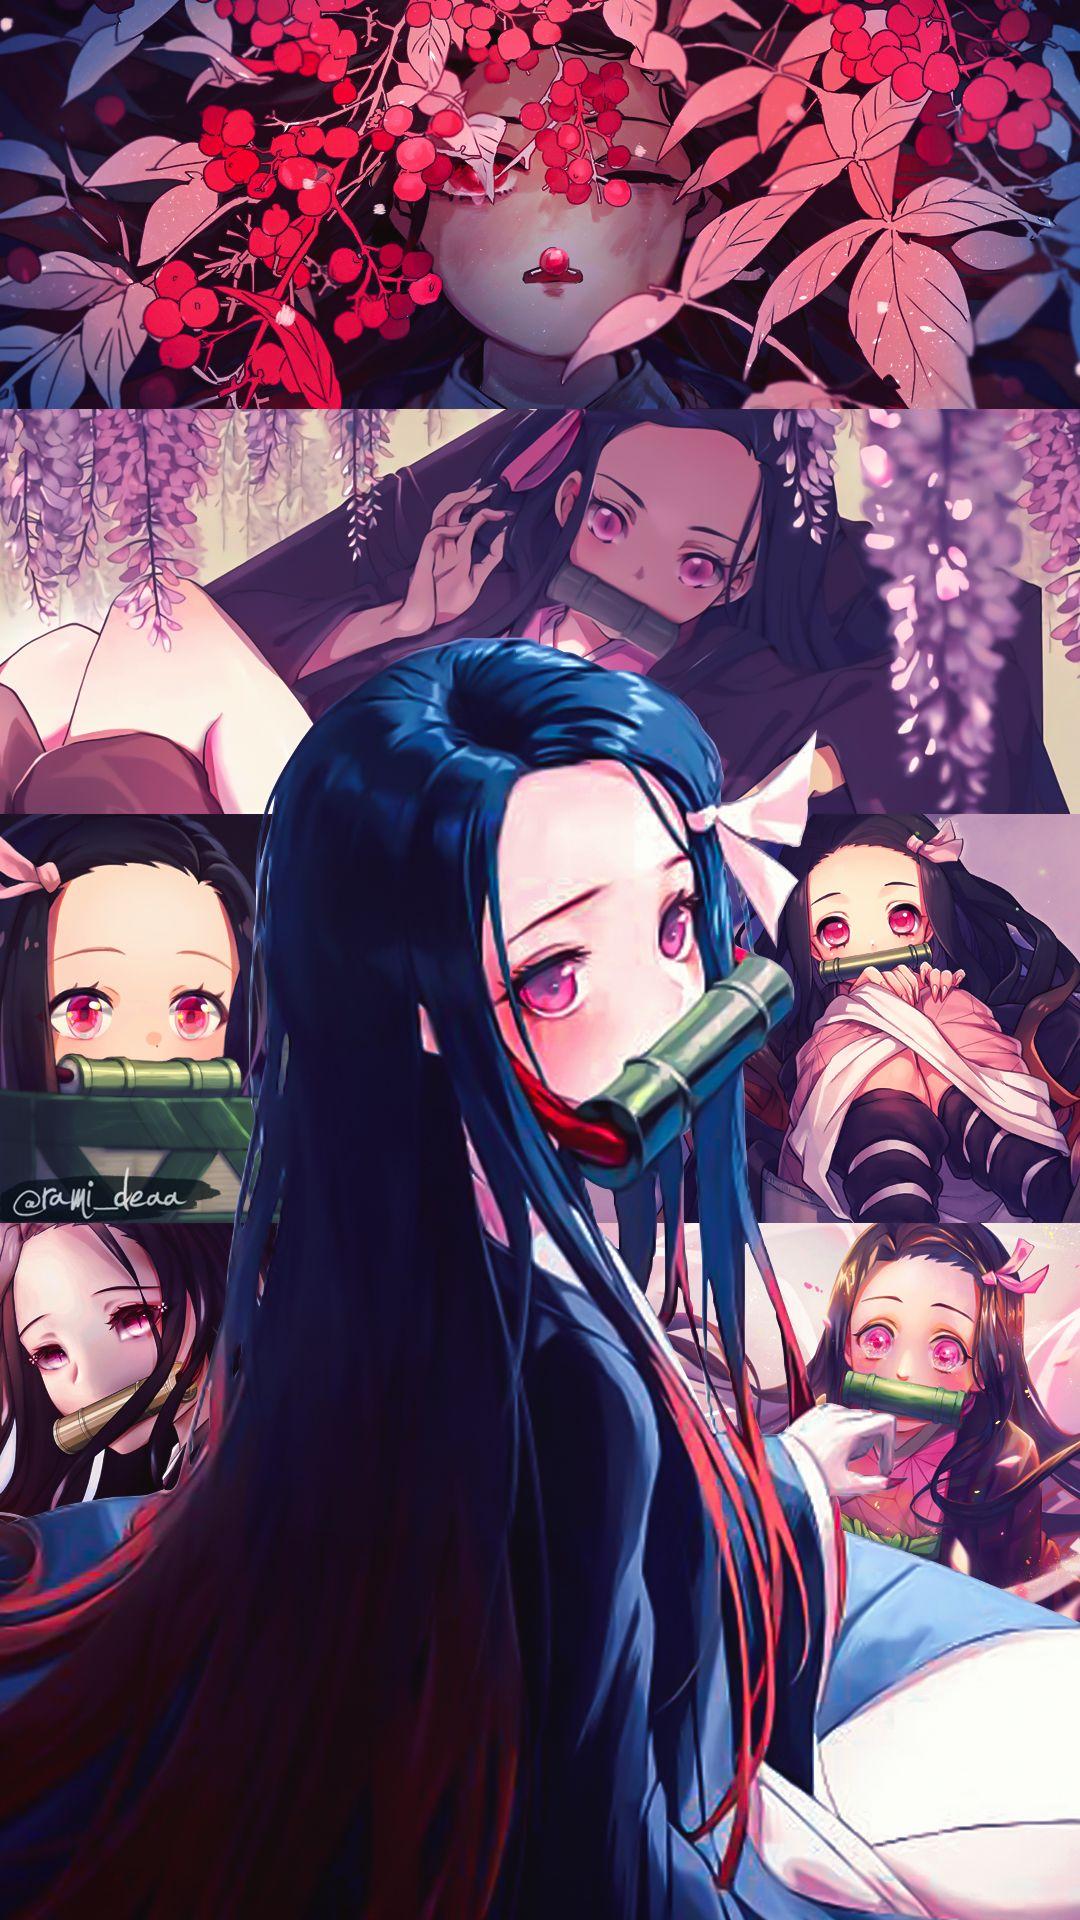 Pin de RamiDeaa em Demon slayer   Animes wallpapers ...